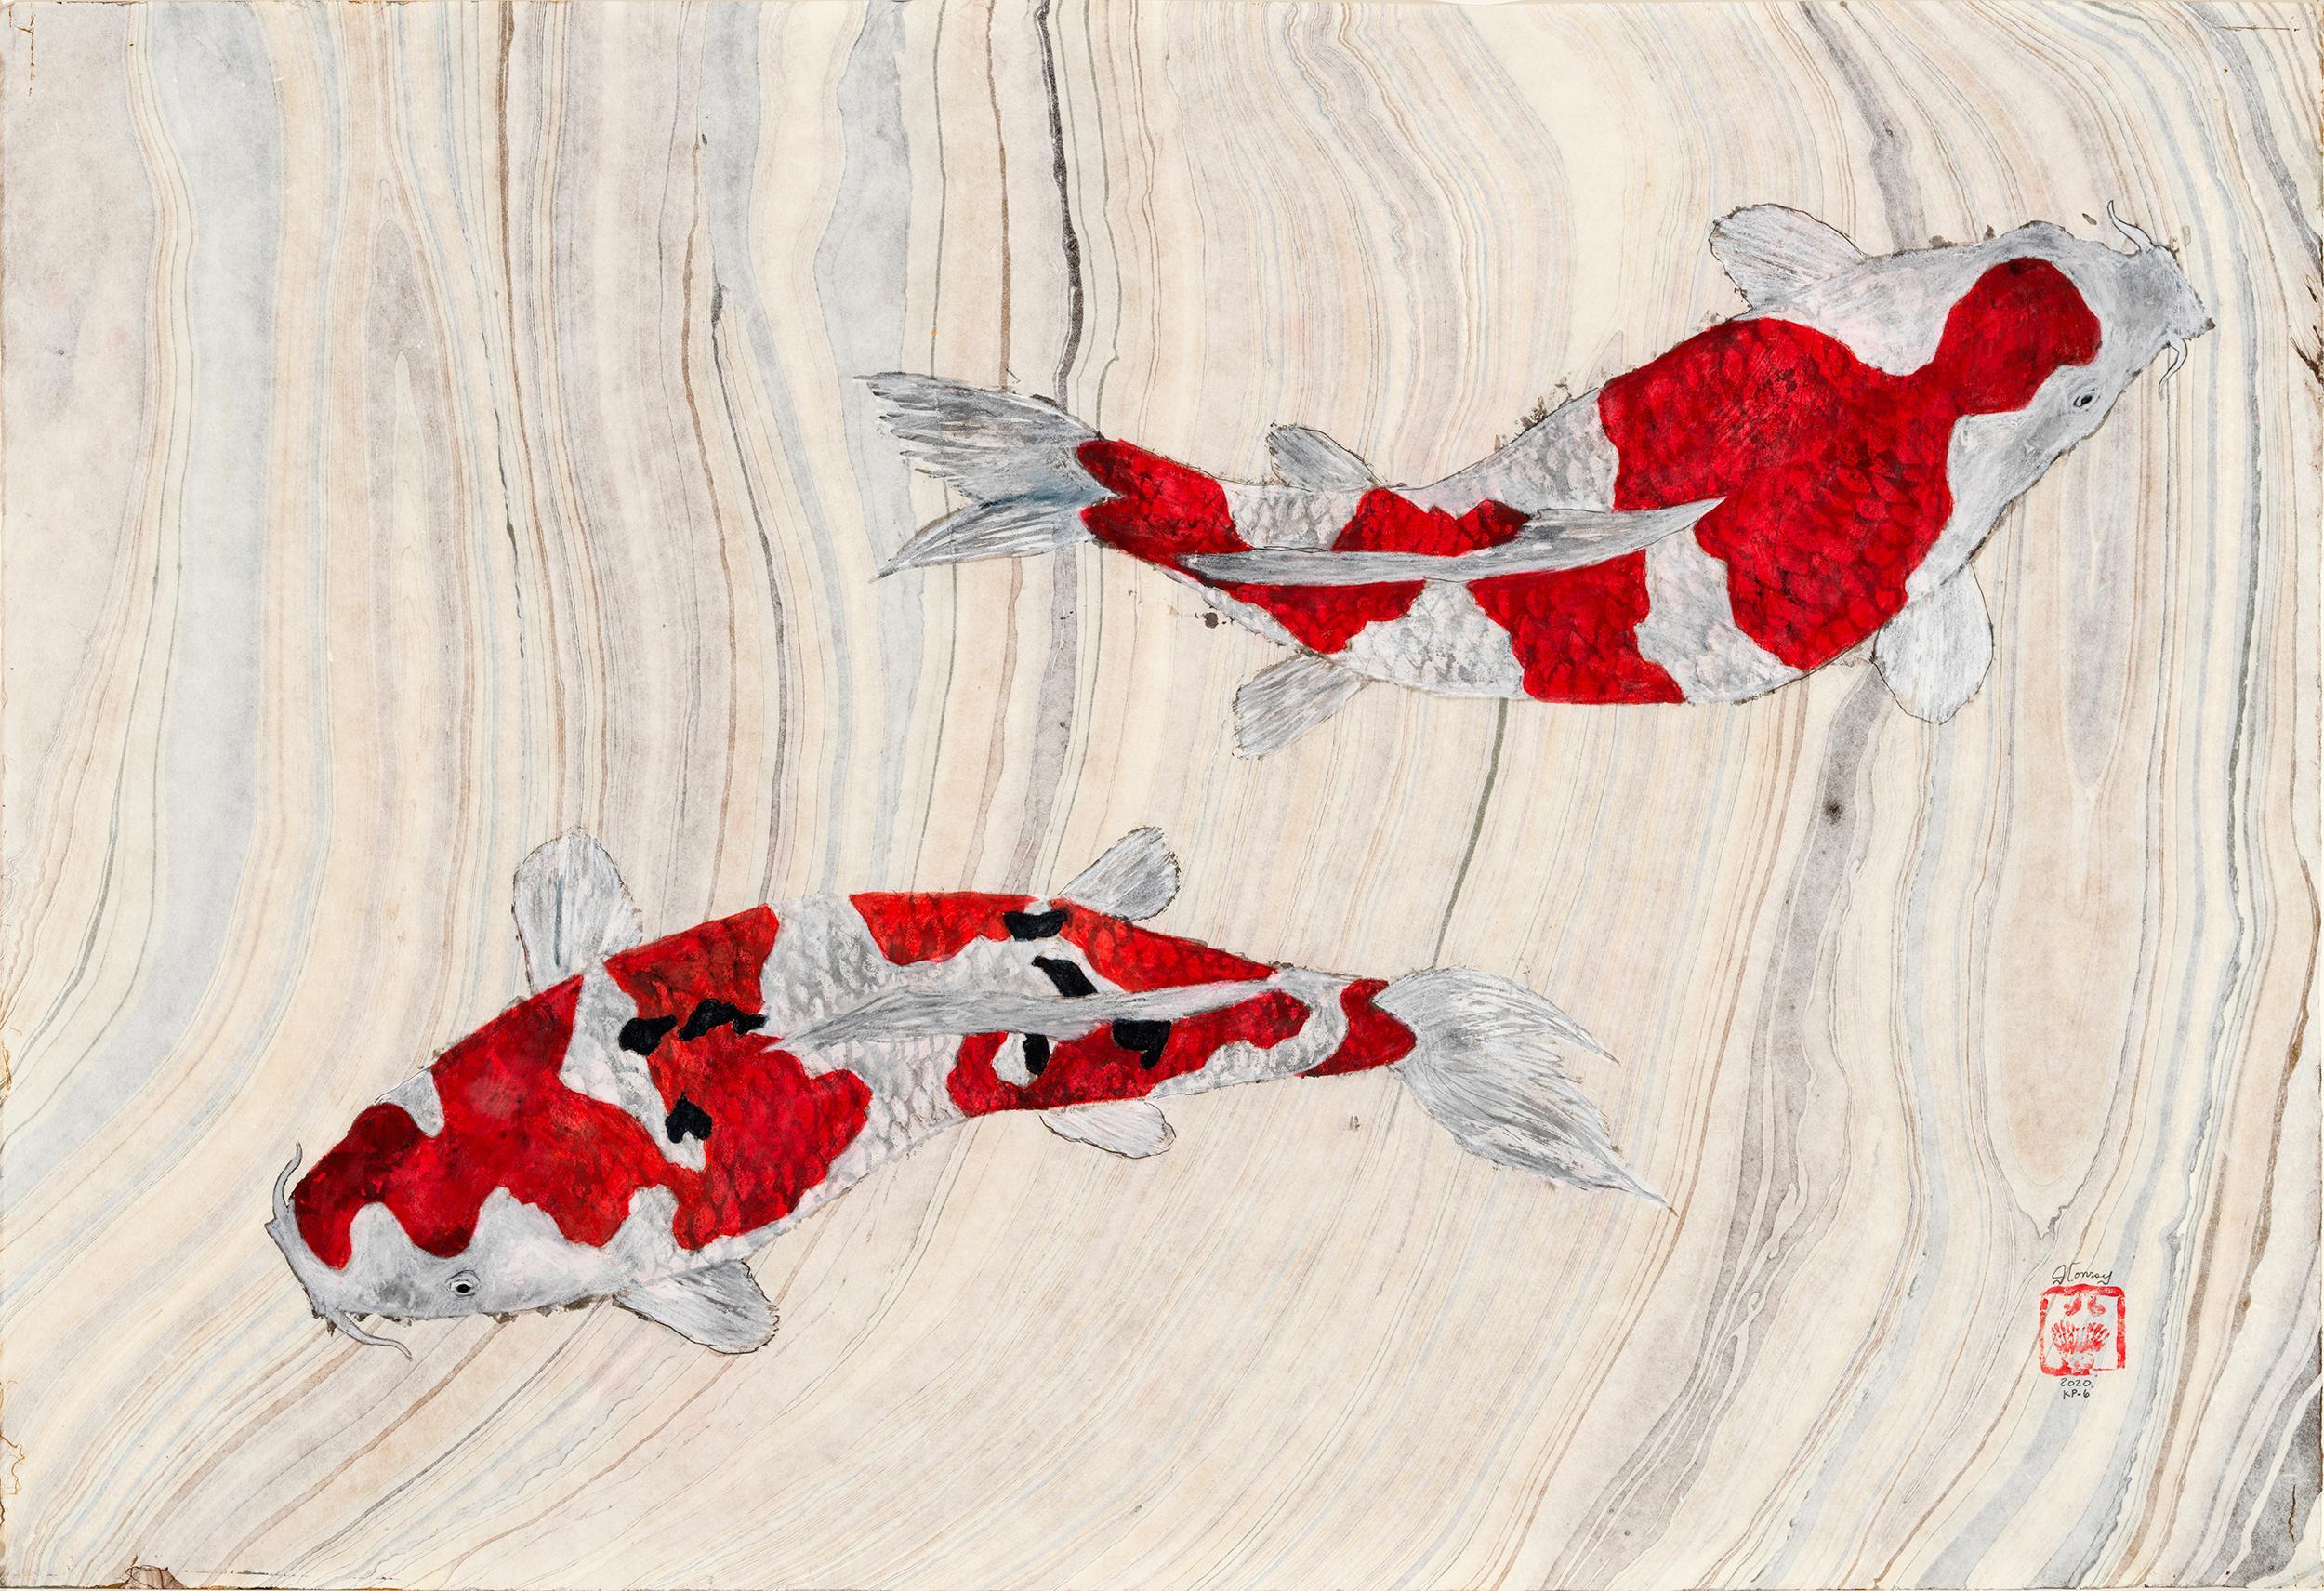 Koi Pond Impasse - Japanese Style Gyotaku Painting on Marbled Mulberry Paper